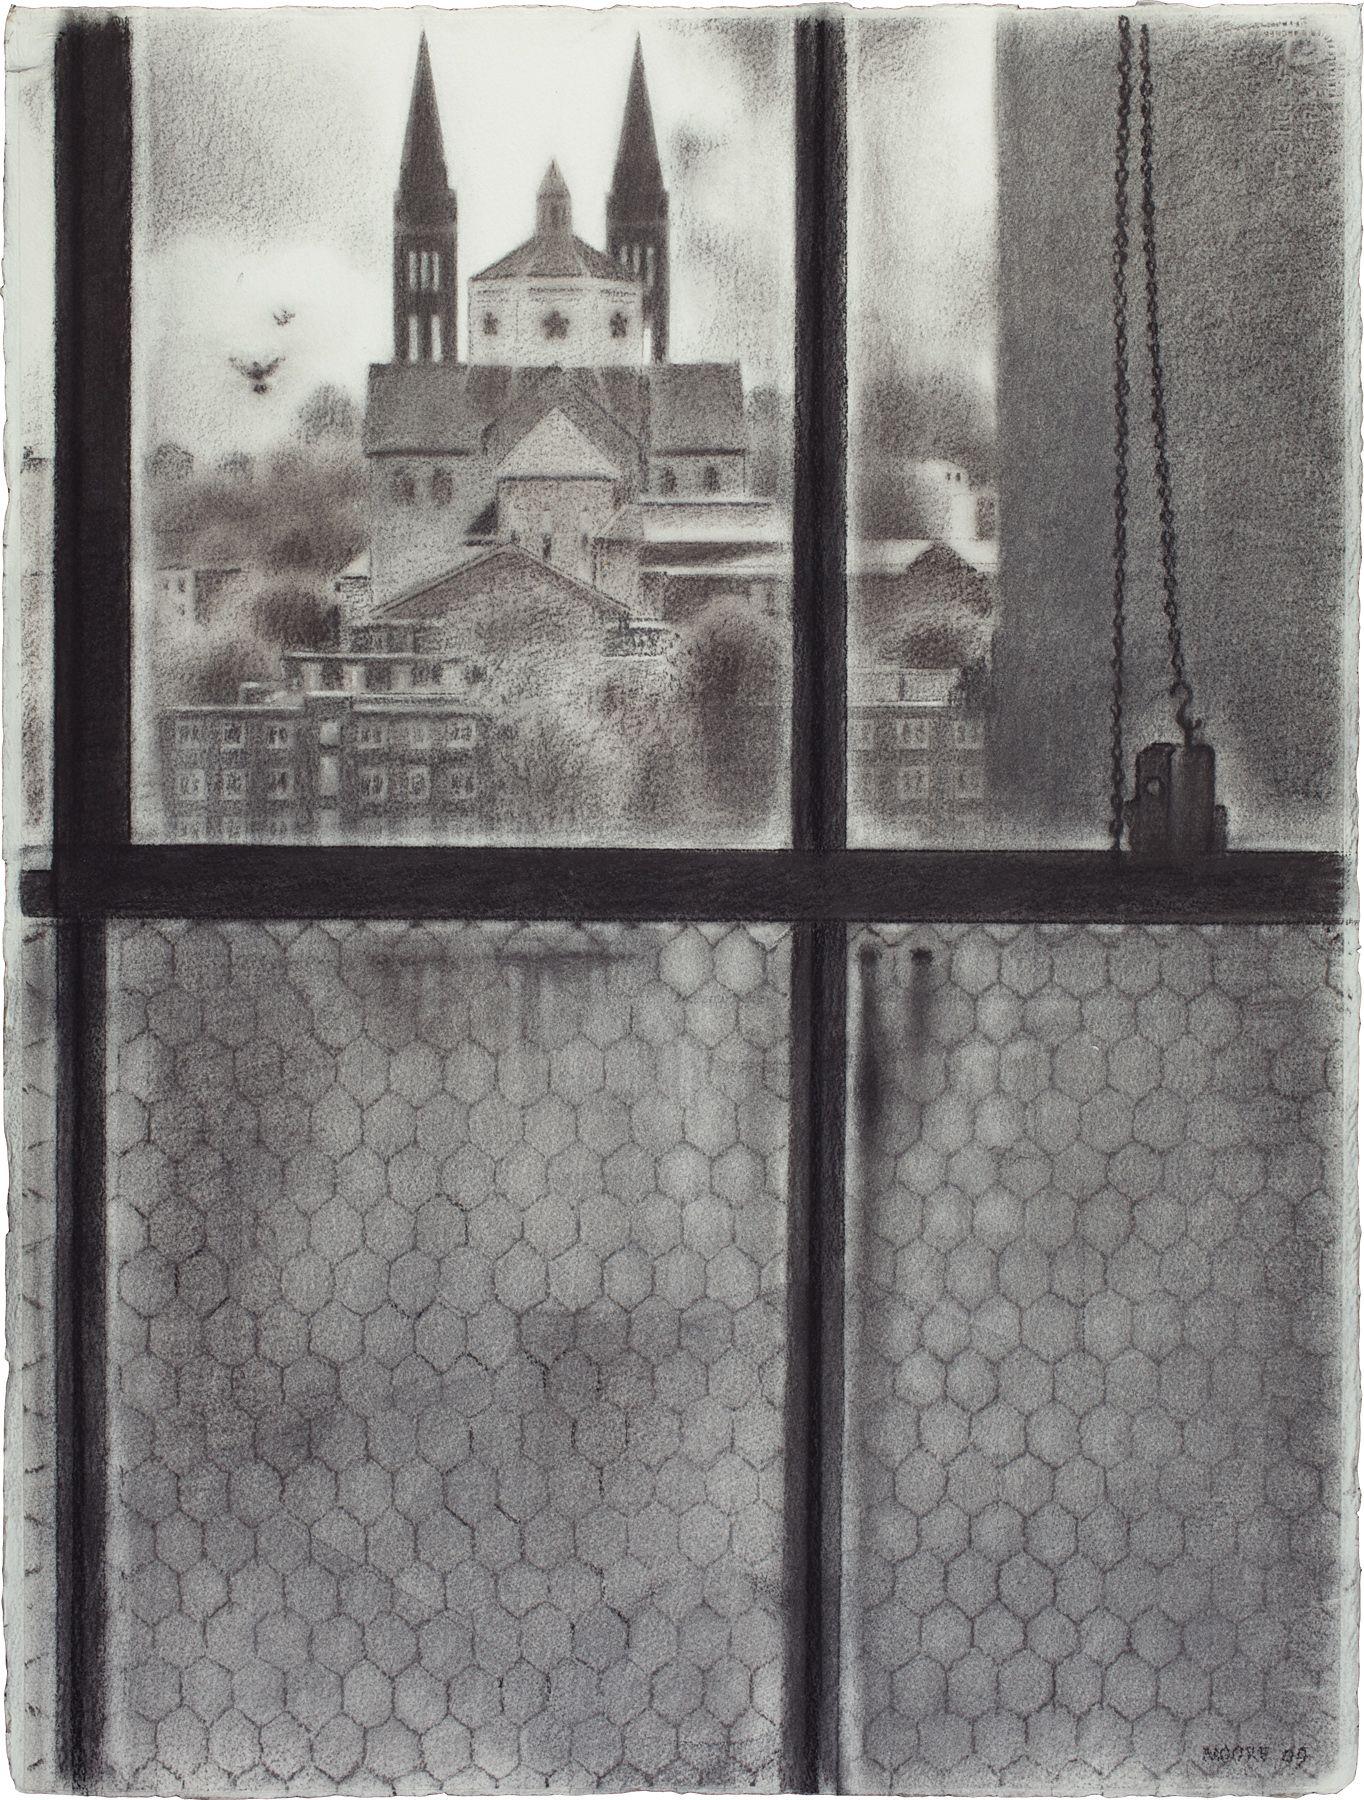 John Moore drawing Locks Gallery